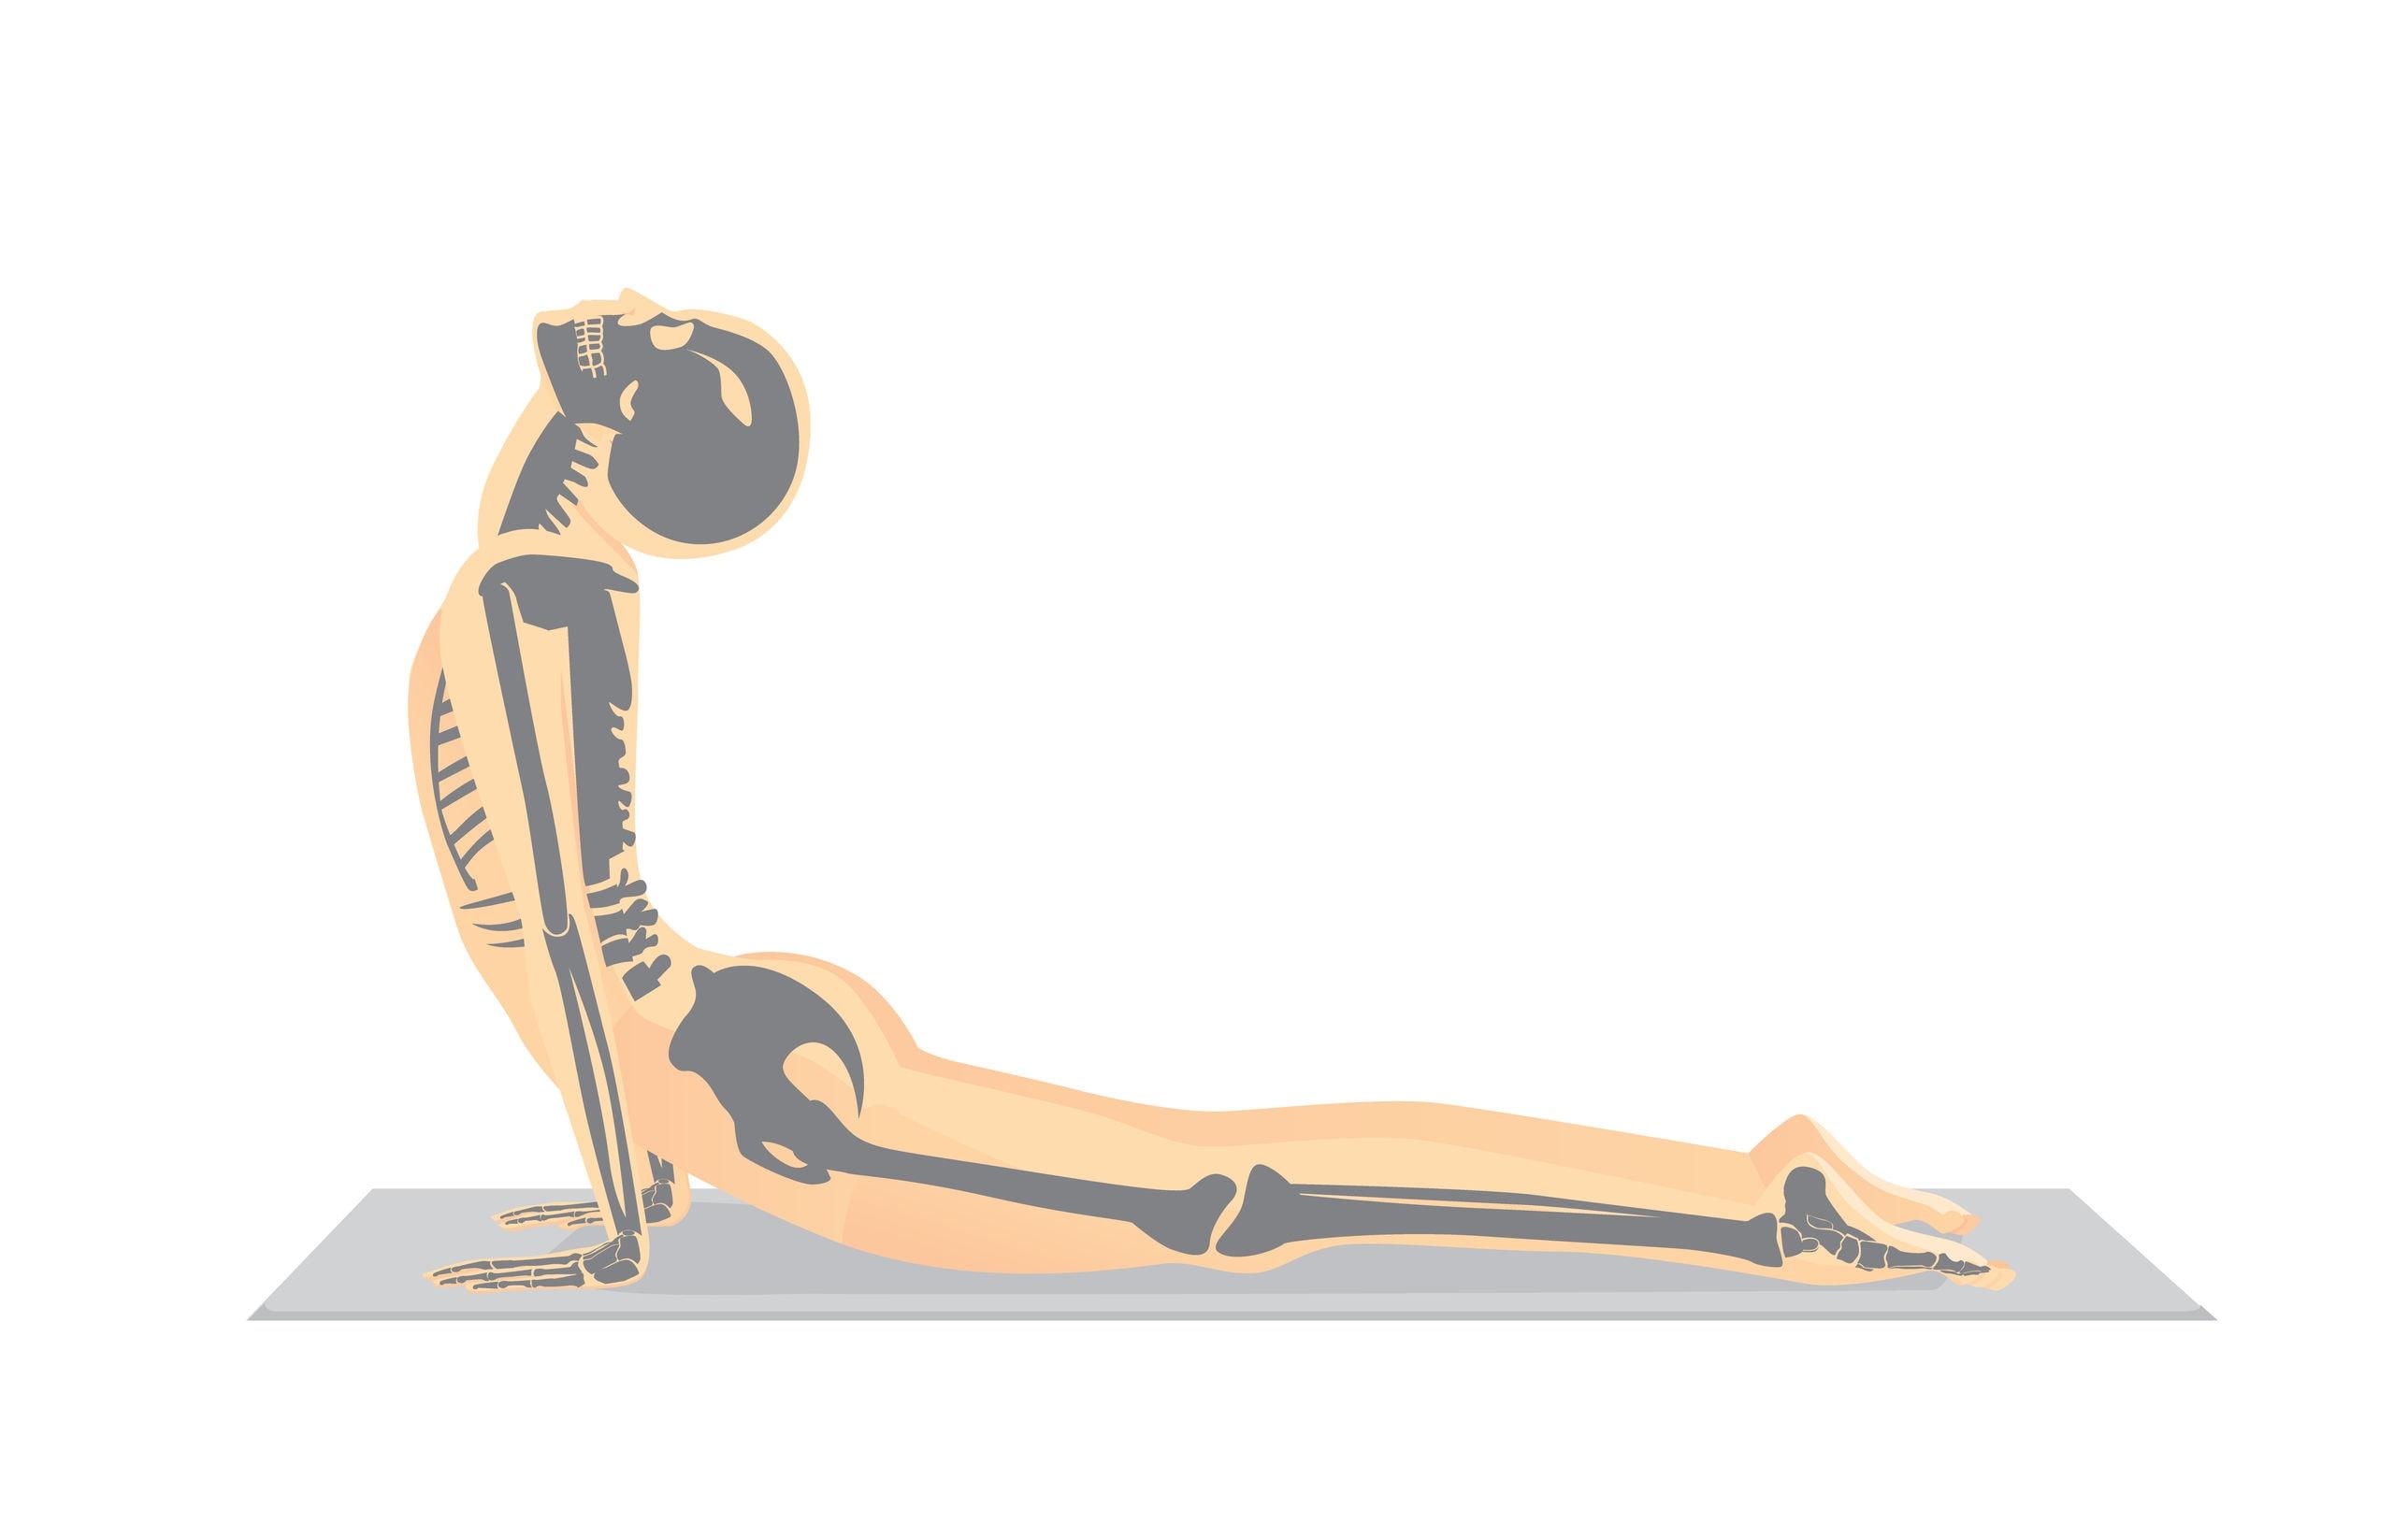 Press Ups McKenzie Method Exercise - McKenzie Method Press Ups Exercise for Back Pain  